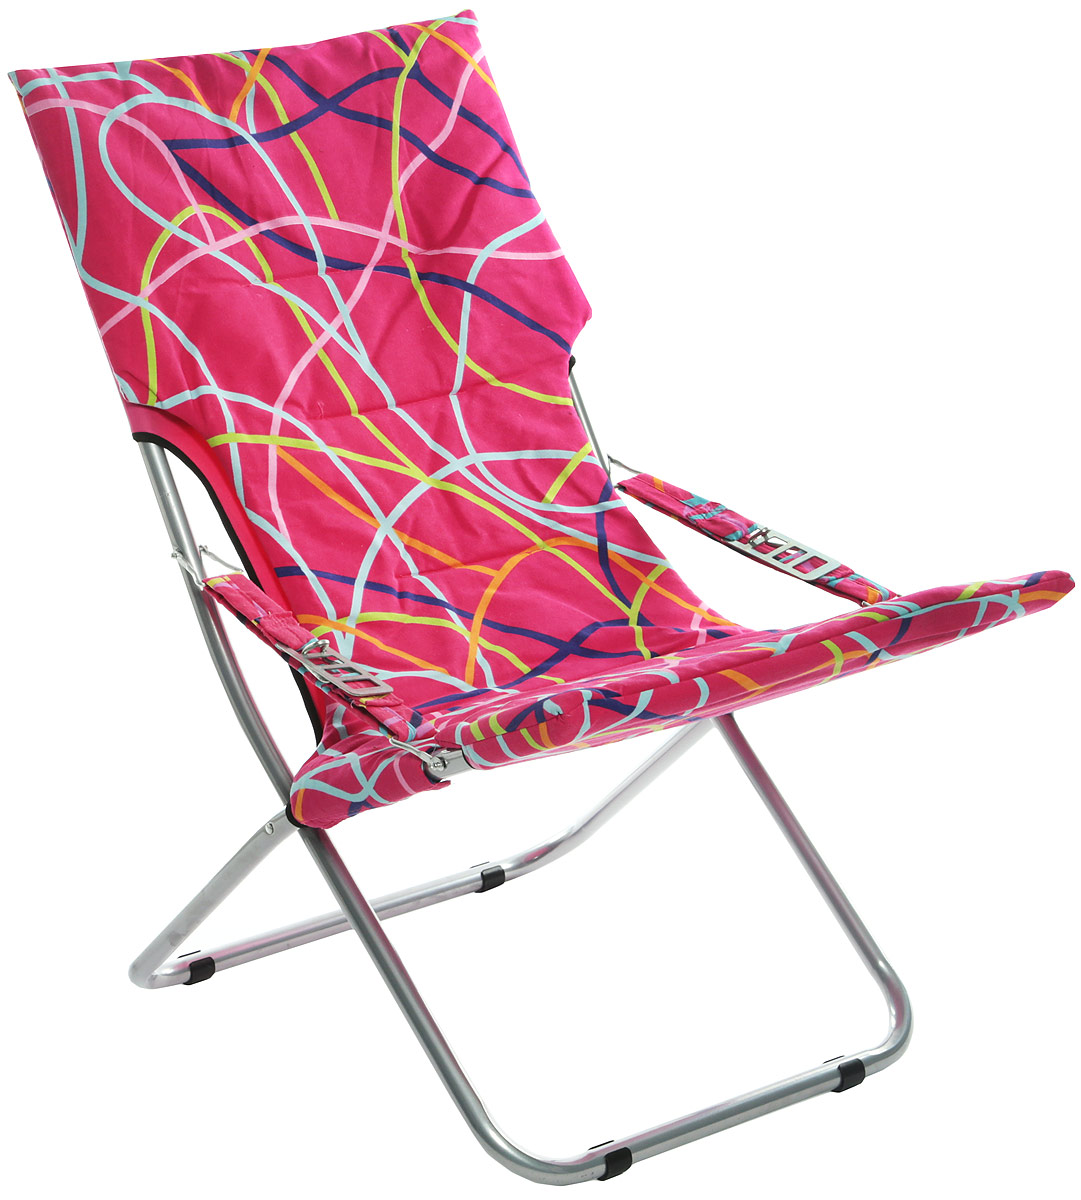 Кресло складное Wildman, цвет: розовый, желтый, синий, 73 х 60 х 100 см v7 1 5 display car radar detector w car charger black 12v english